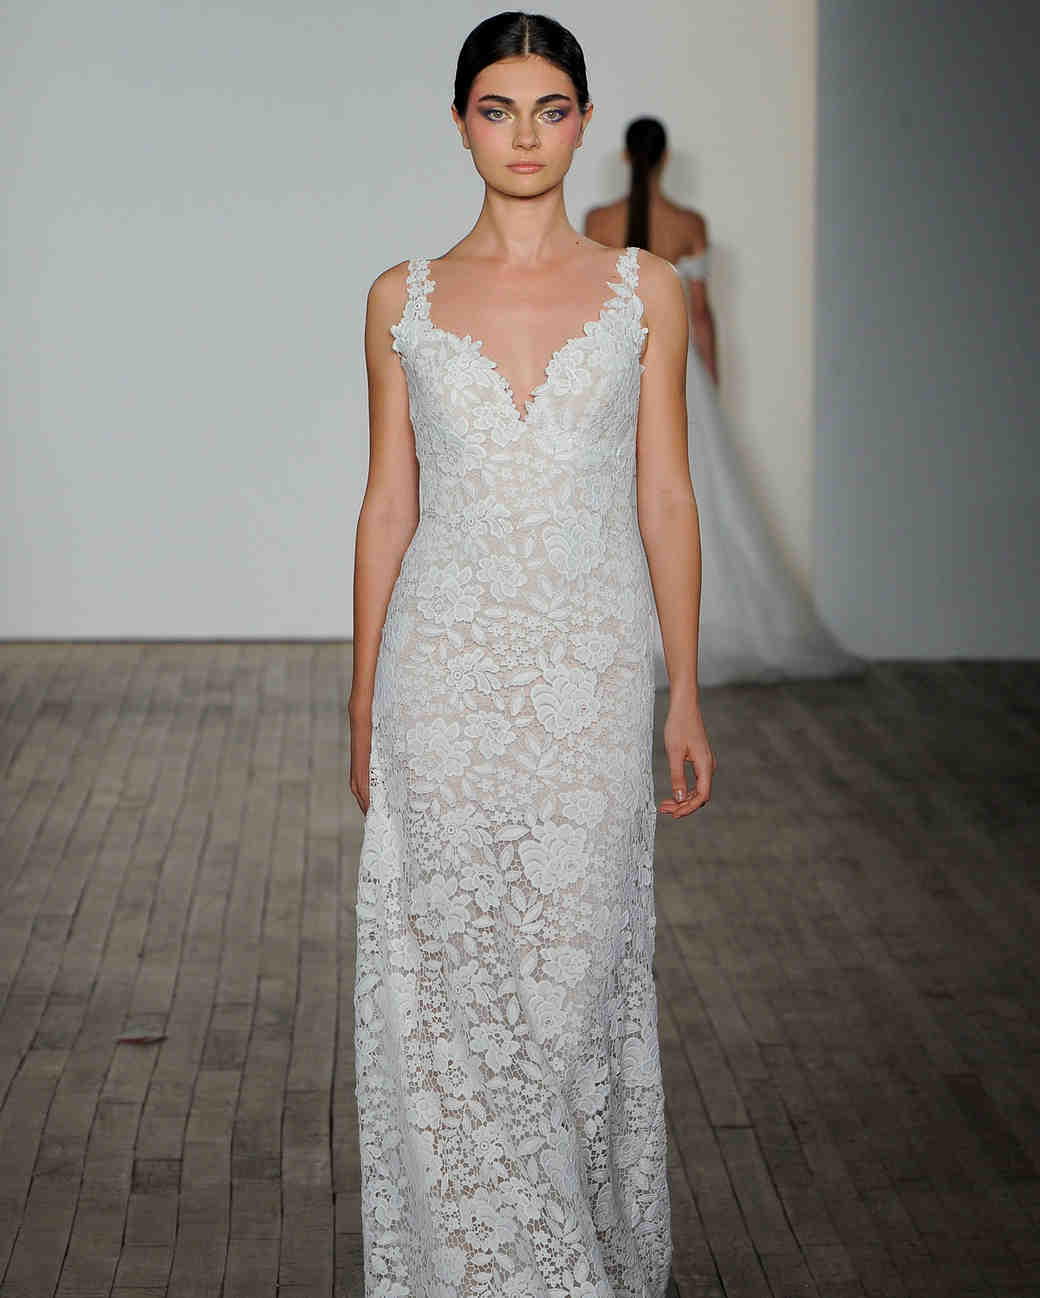 d60a8479 Blush by Hayley Paige Fall 2019 Wedding Dress Collection | Martha Stewart  Weddings